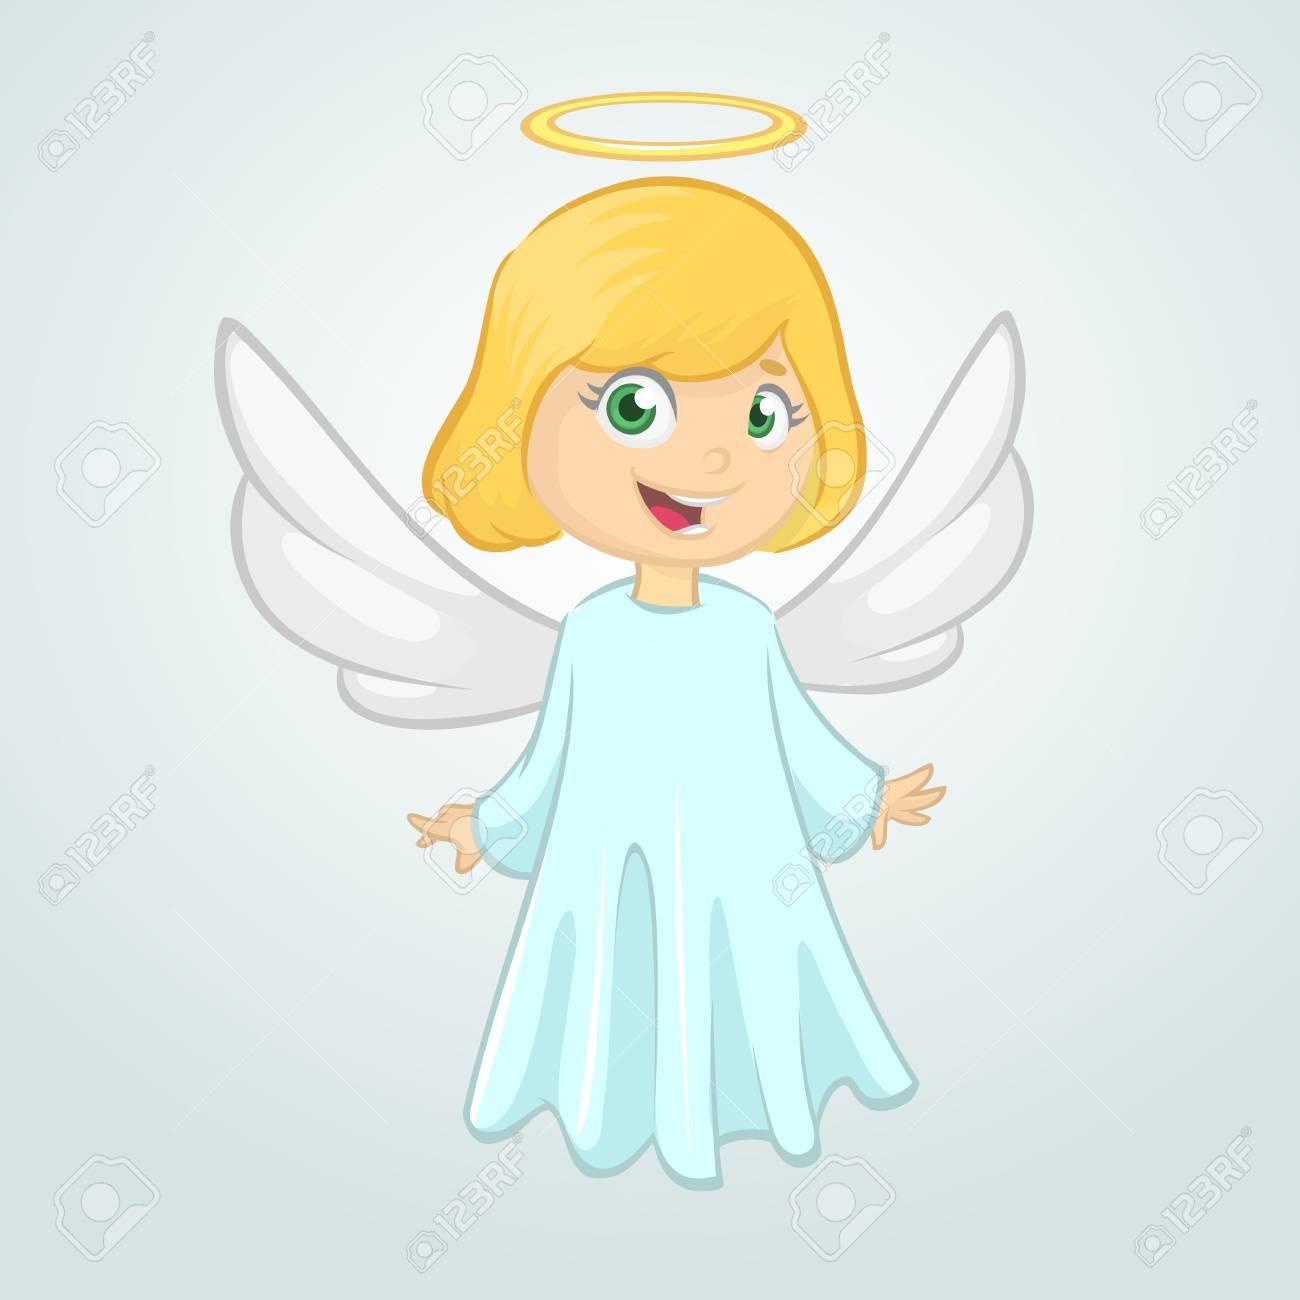 Christmas Angel.Cute Happy Christmas Angel Cartoon Character Illustration